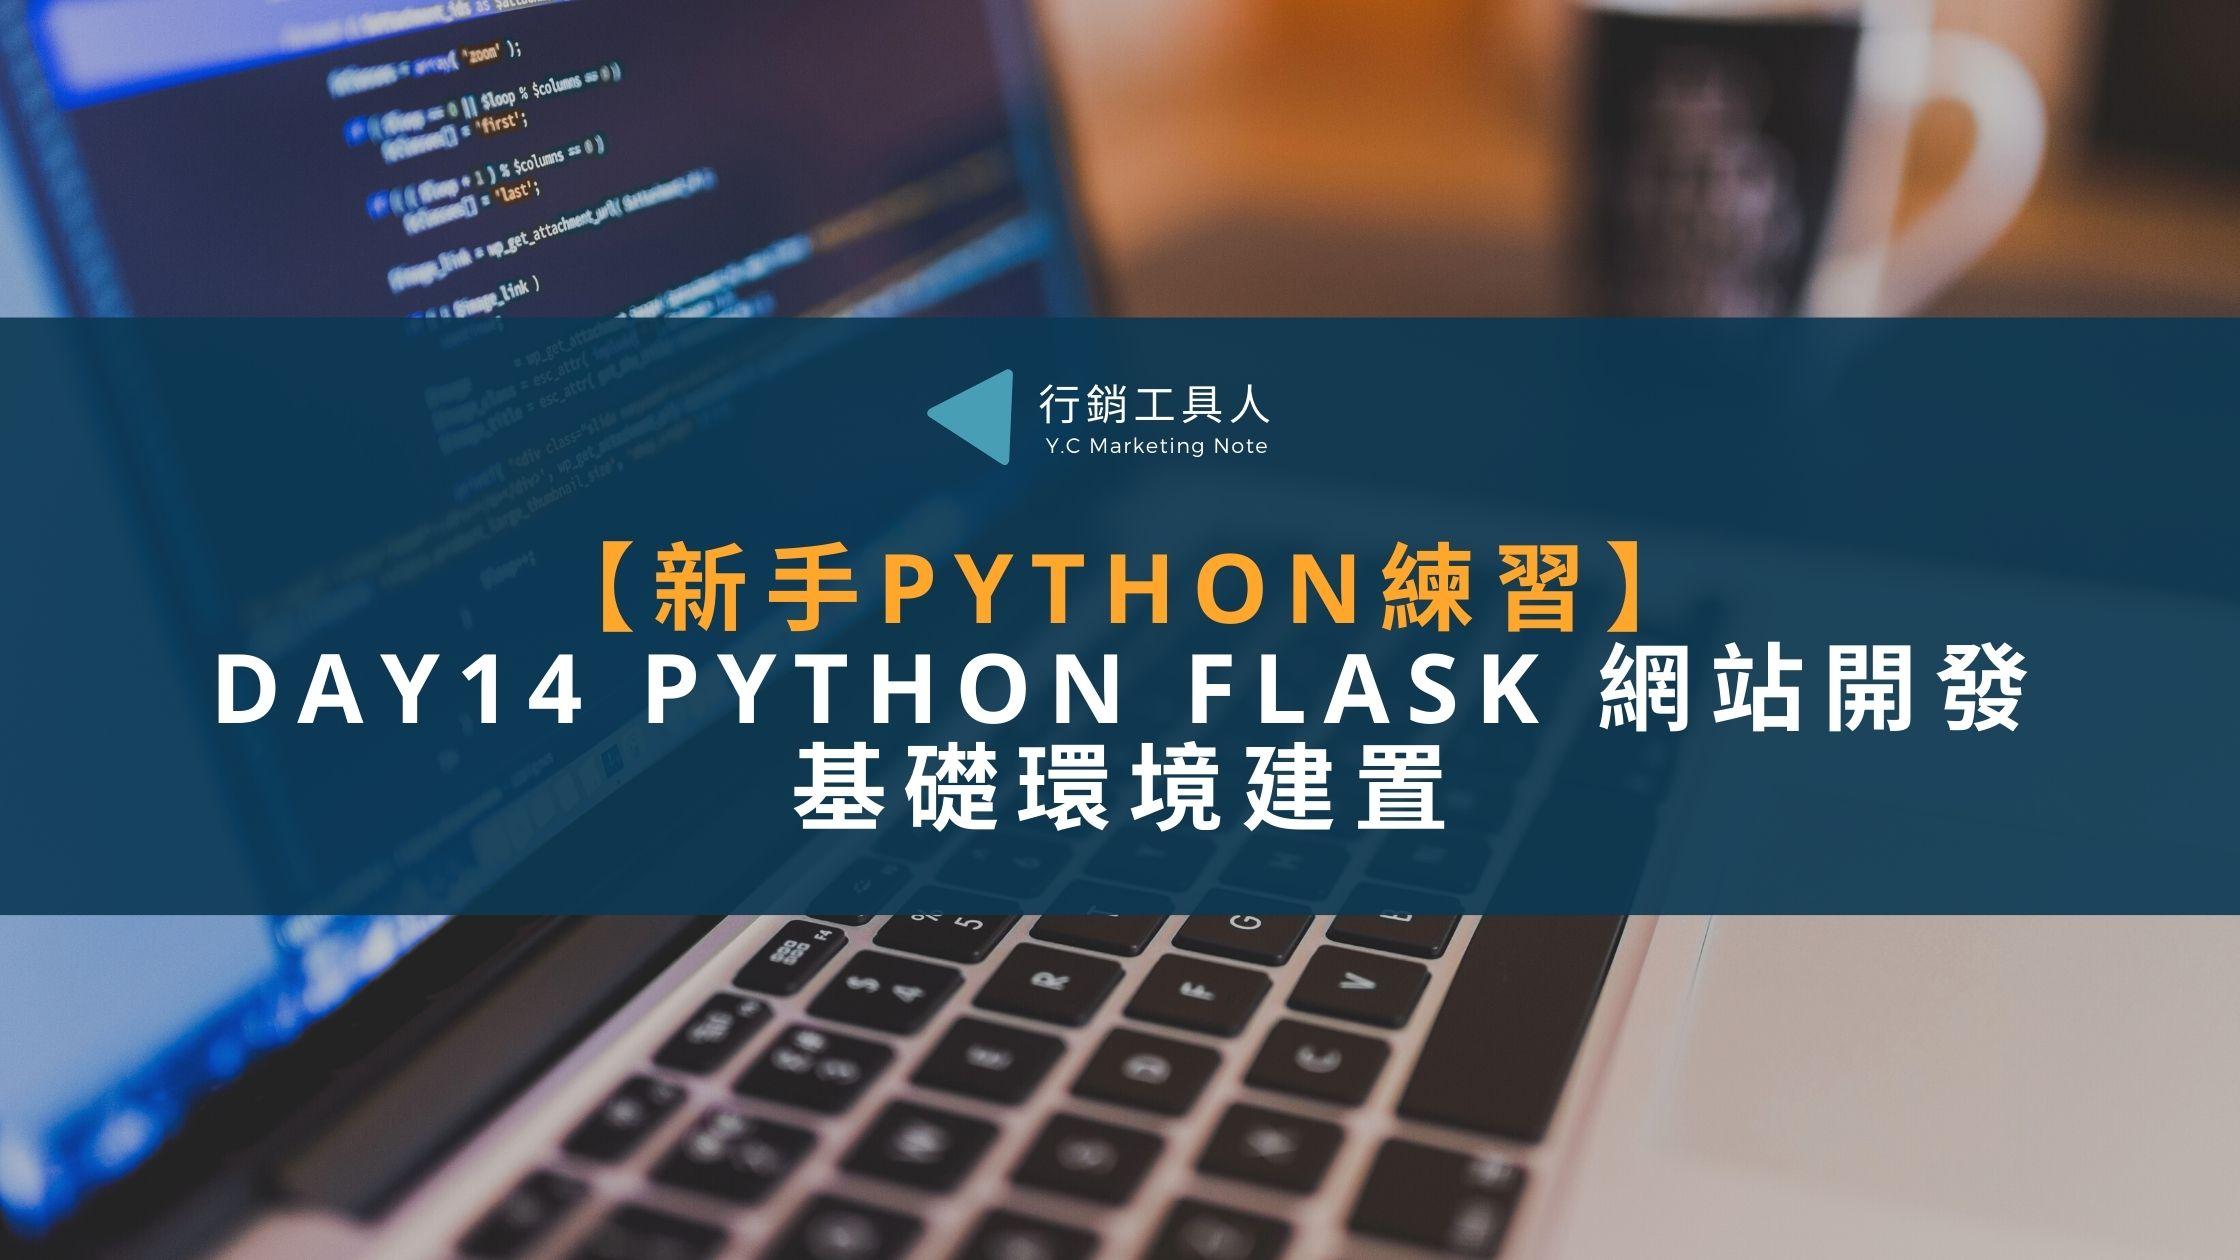 Python Flask網站開發(基礎環境建置安裝)【Python練習Day14】